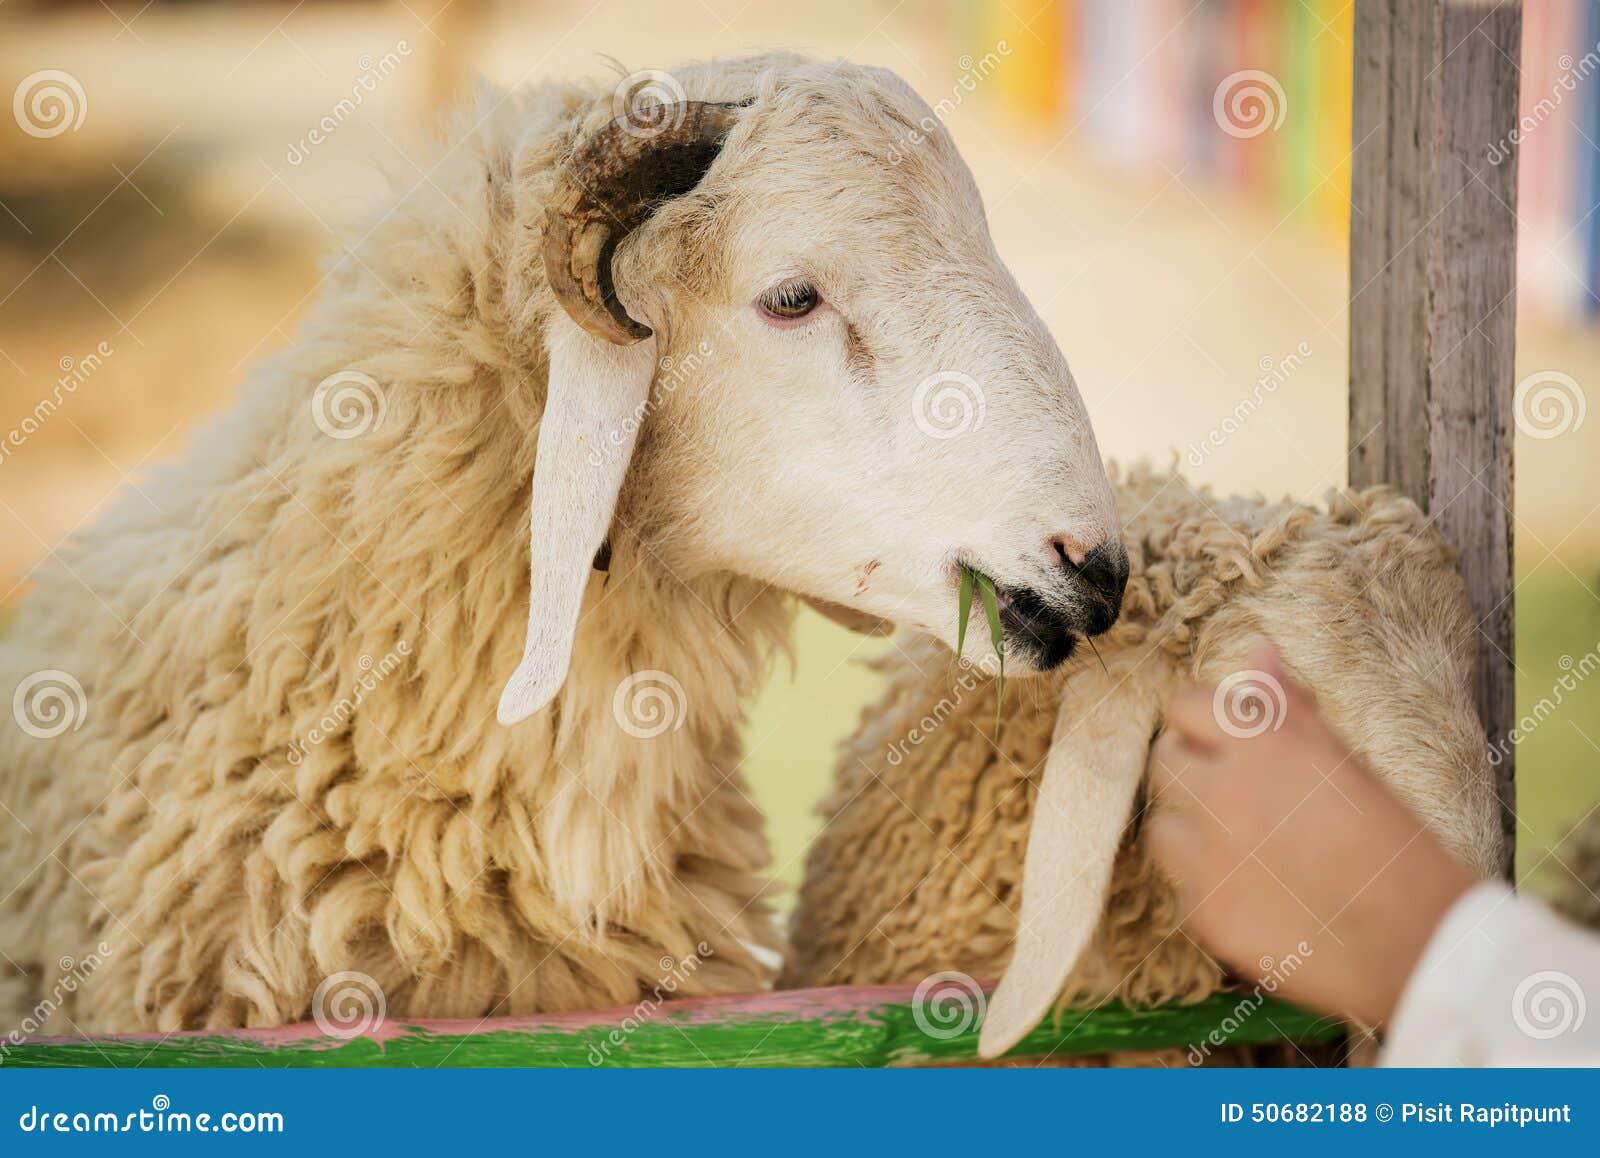 Download 在农场哄骗哺养的绵羊,泰国 库存照片. 图片 包括有 现有量, 女演员, 羊毛, 敌意, bothy, 羊羔 - 50682188